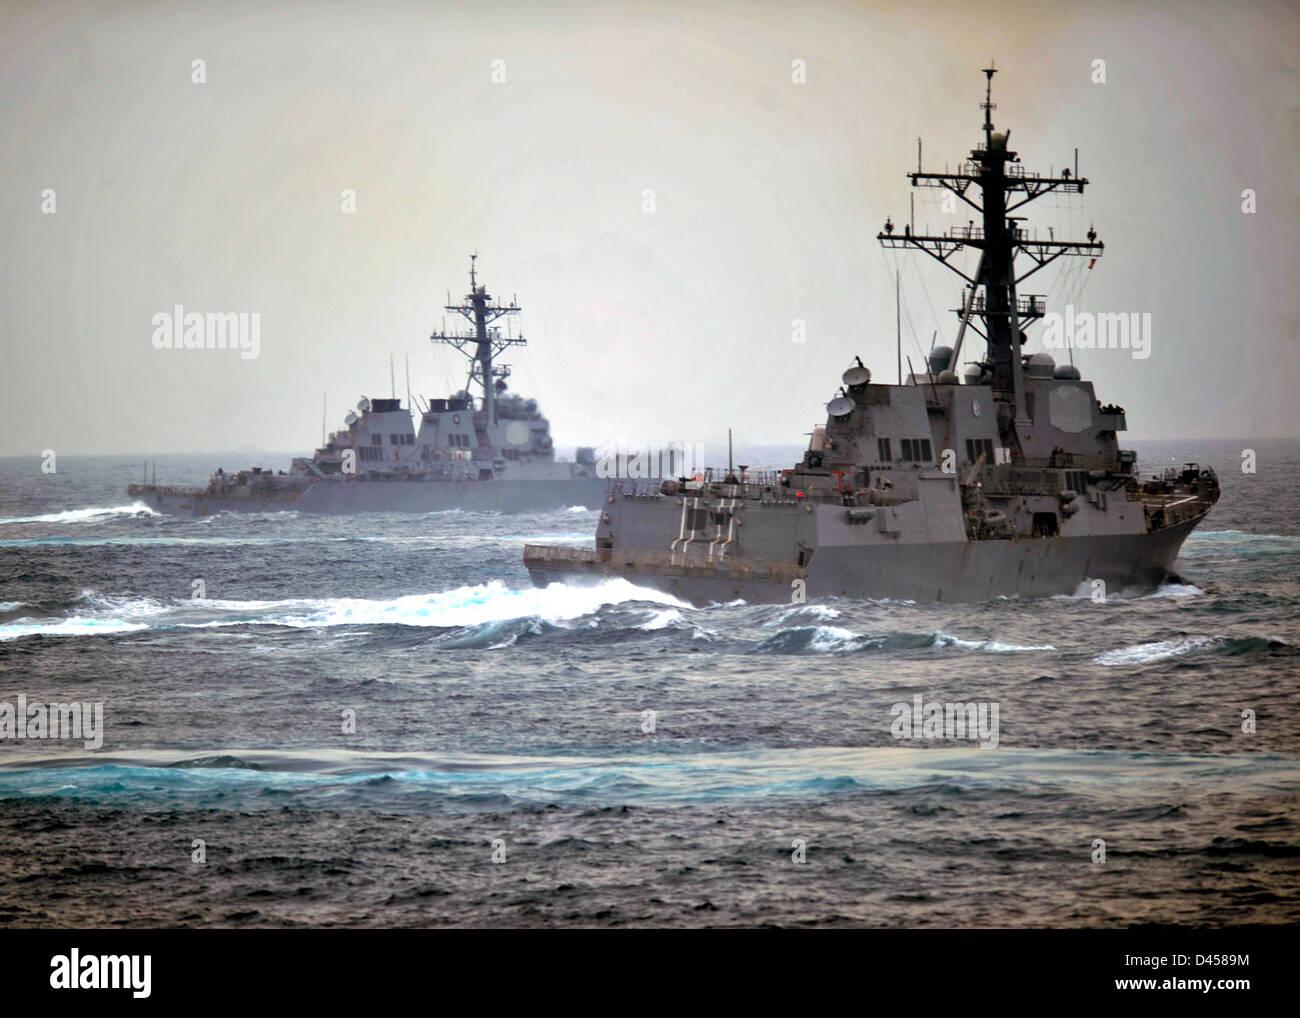 Navy ships perform evasive maneuvers during a simulated strait transit exercise. Stock Photo